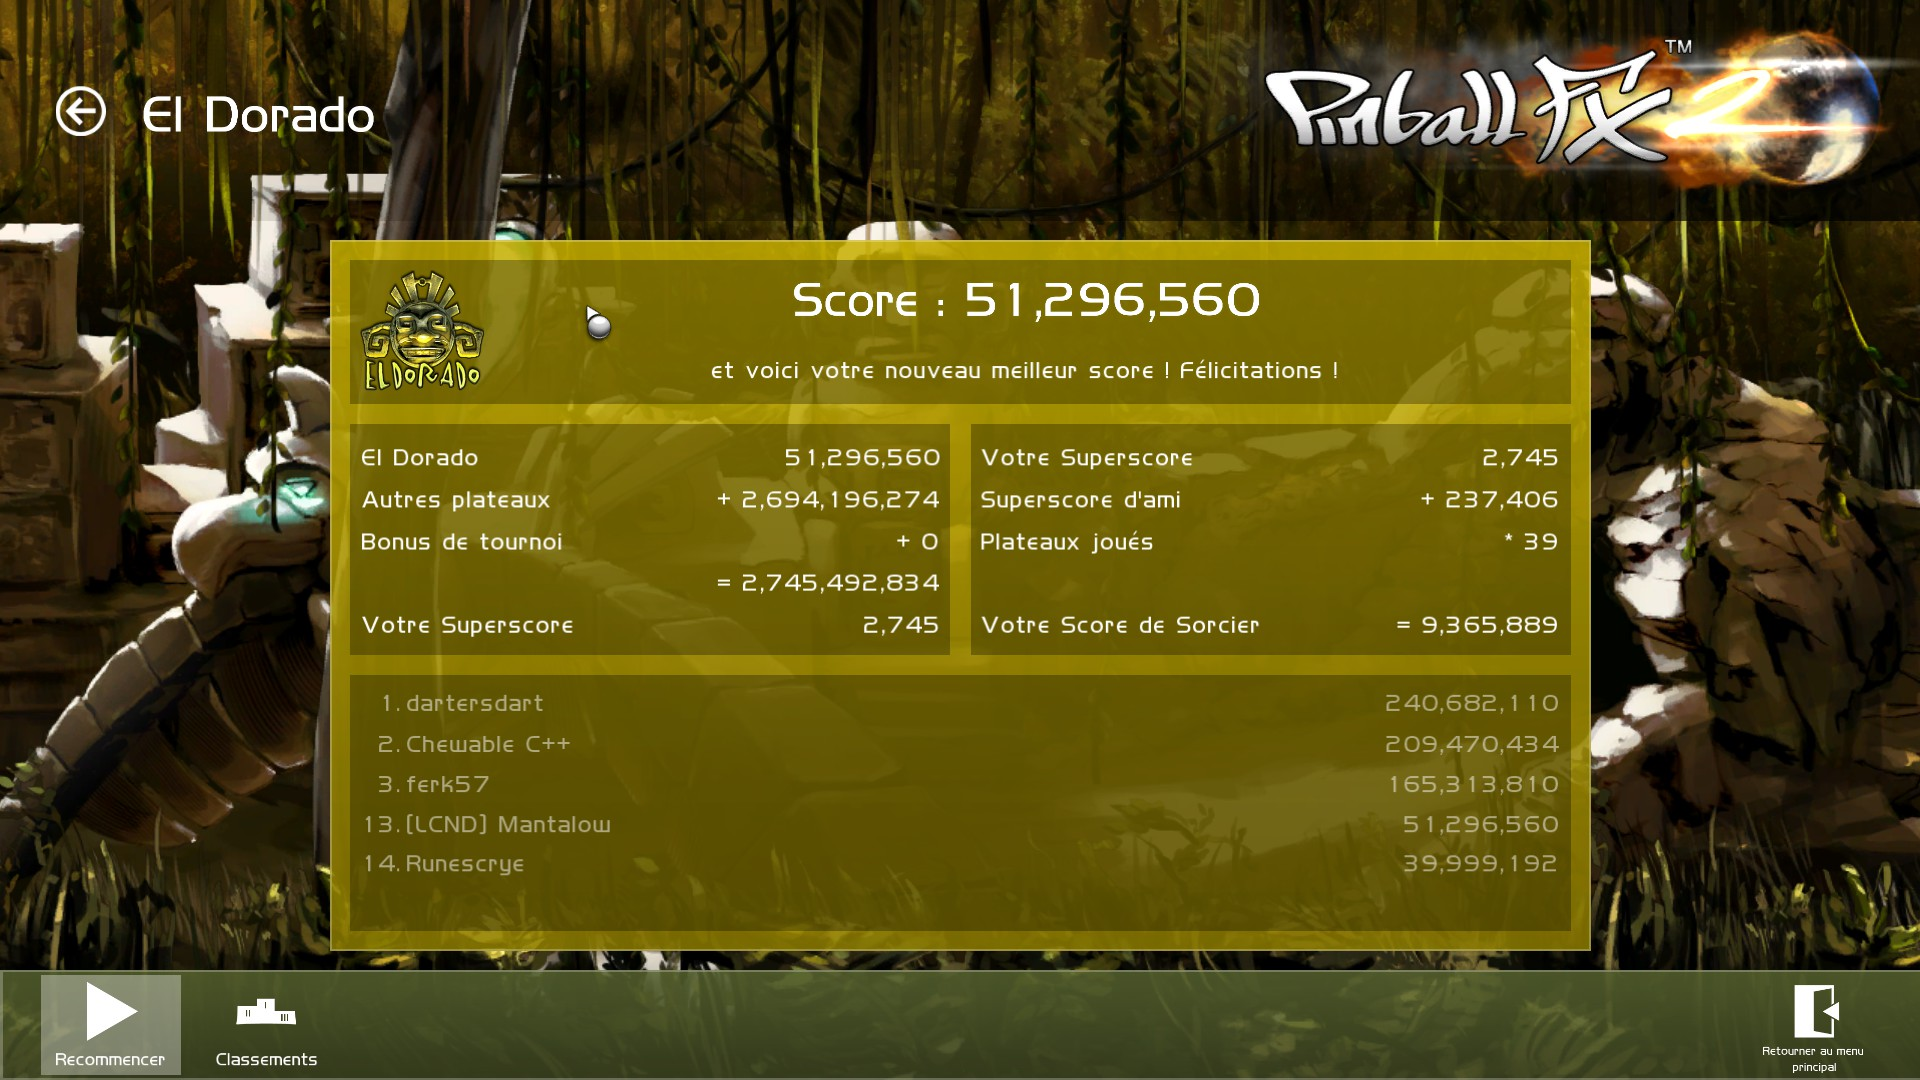 Mantalow: Pinball FX 2: El Dorado (PC) 51,296,560 points on 2015-03-05 10:05:16